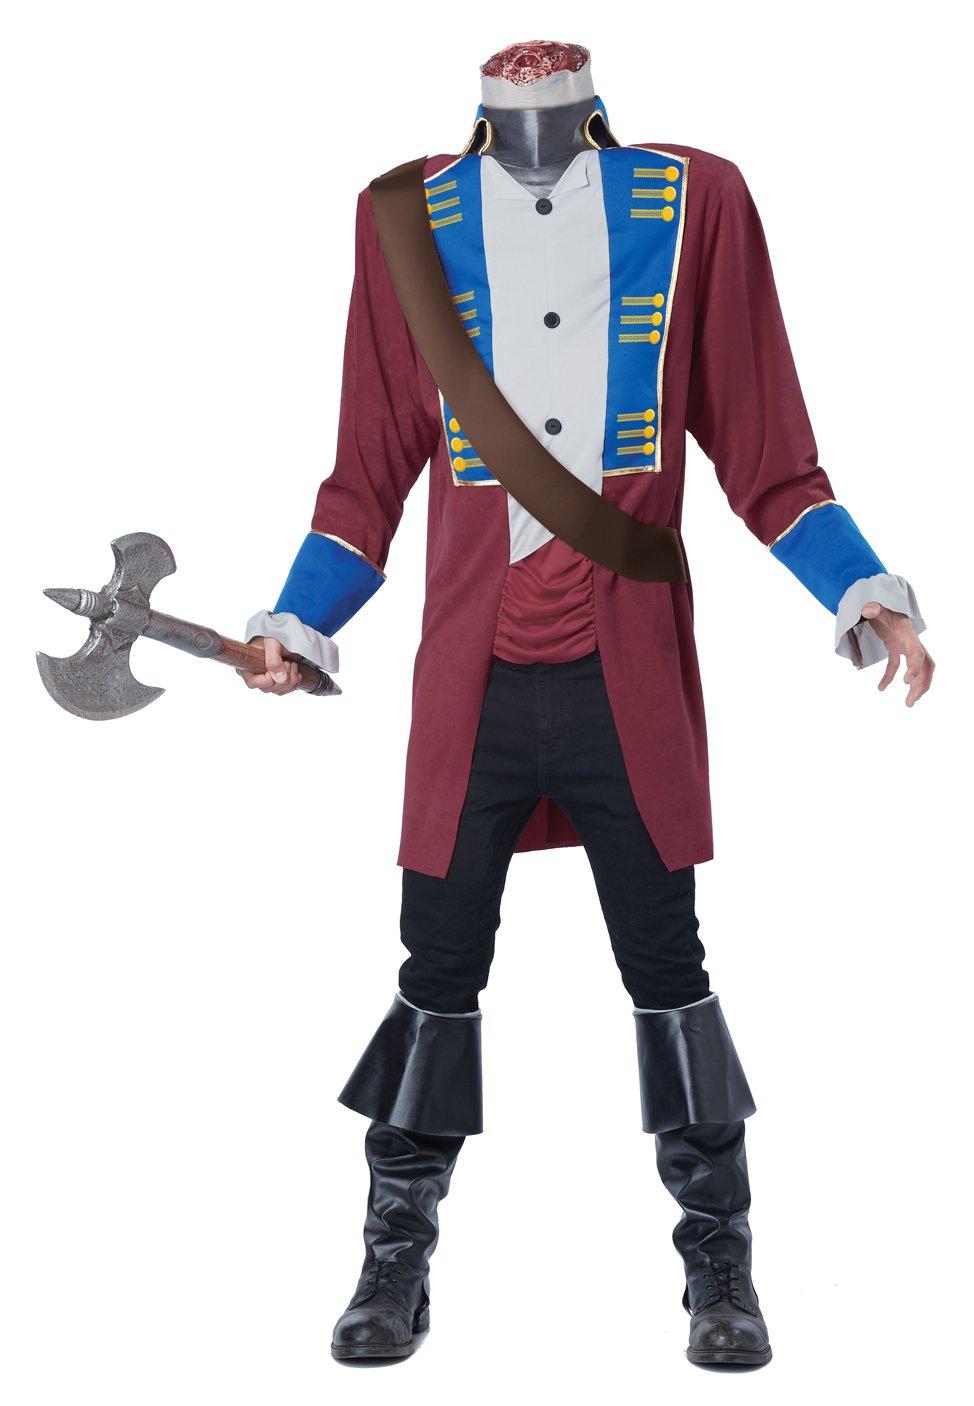 Sleepy Hollow Headless Horseman Adult Costume Size: X-Large #01598